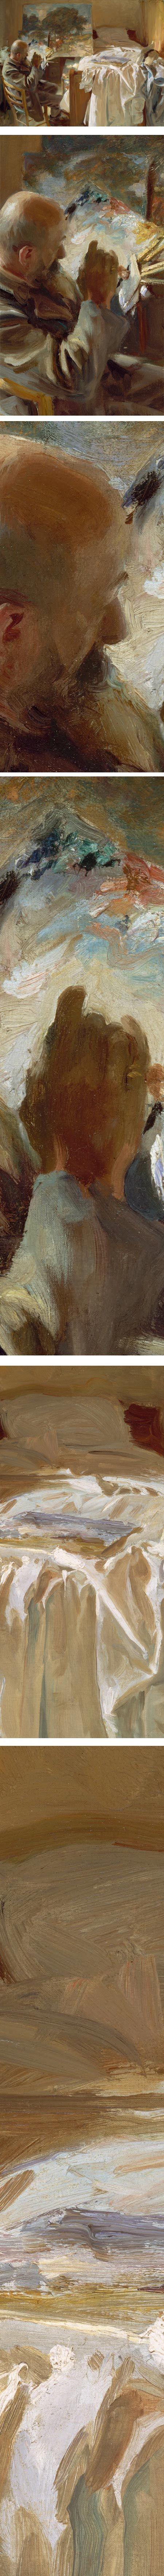 An Artist in His Studio, John Singer Sargent